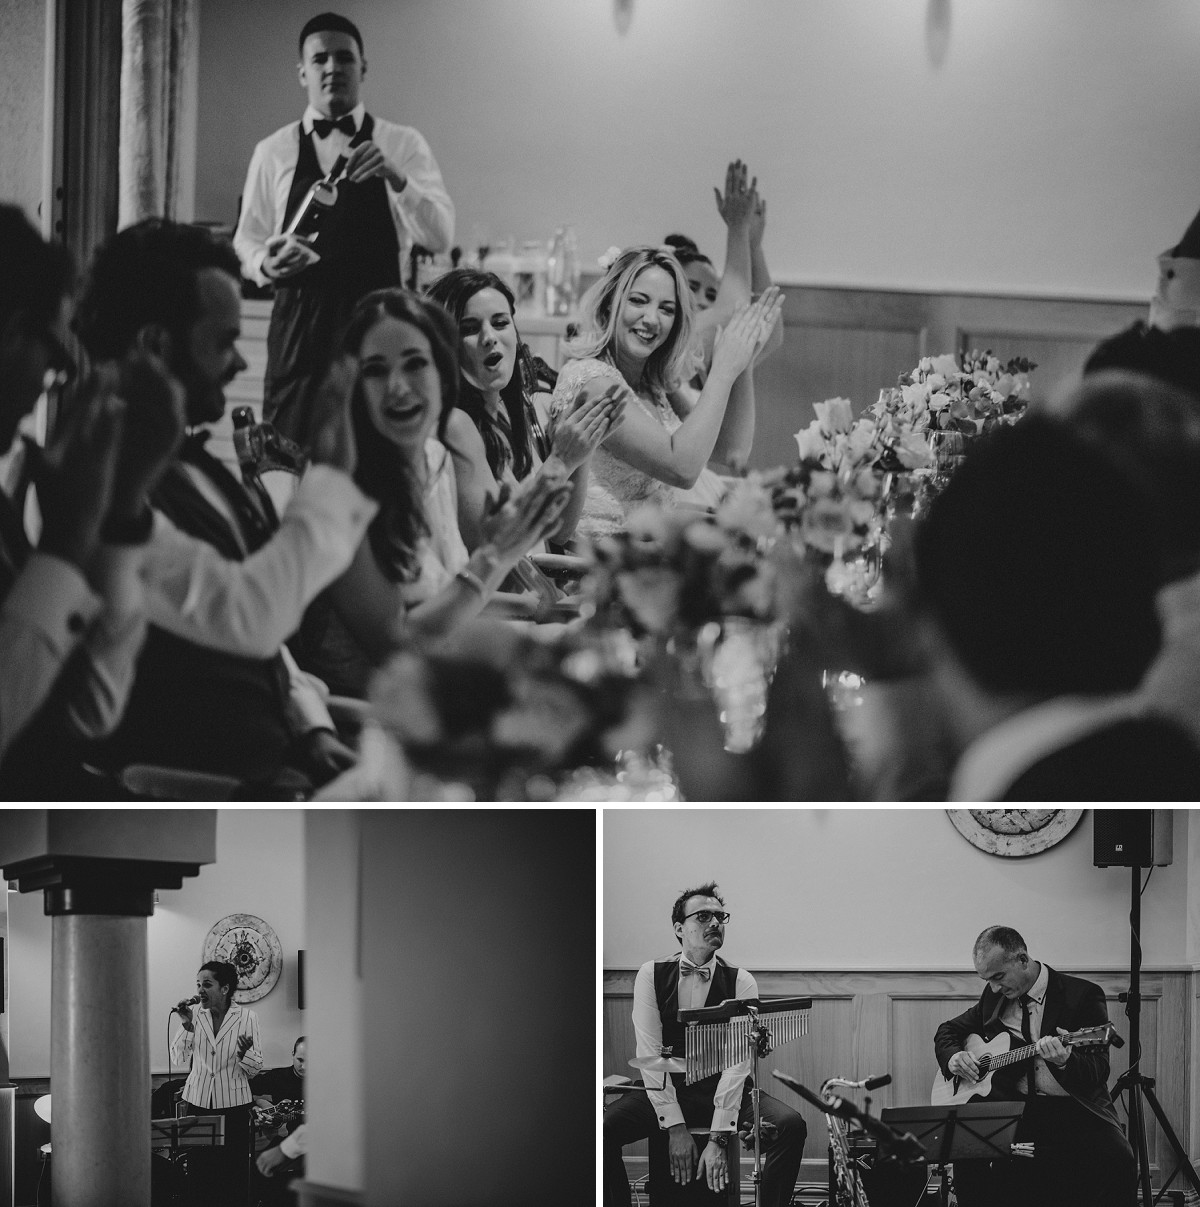 ariston_opatija_croatia_wedding_photographer_063.jpg